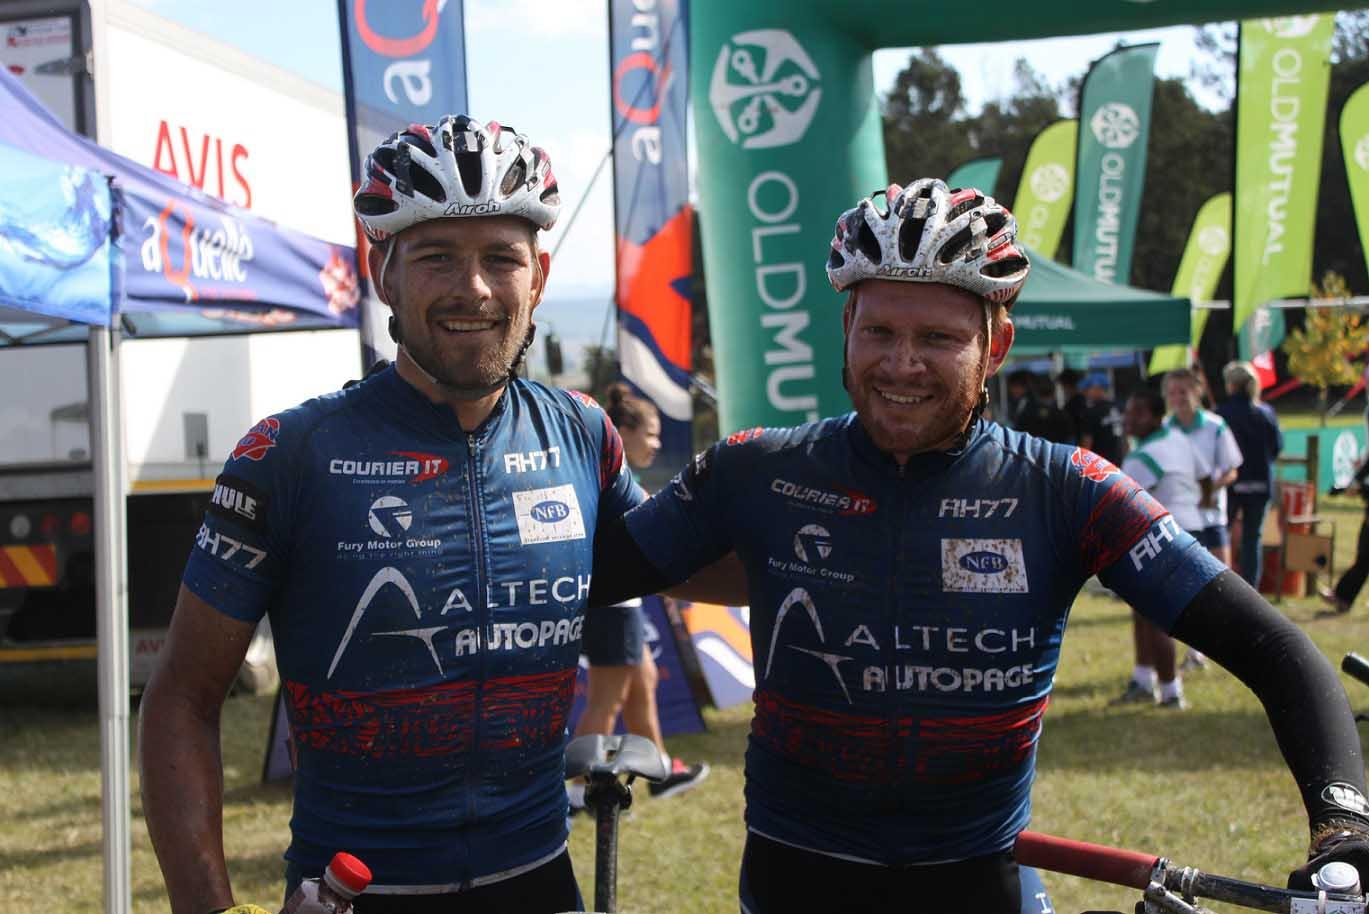 Pieter Seyffert (left) and Hanco Kachelhoffer of Altech Autopage Karan Beef won stage seven of the 2015 Old Mutual joBerg2c at MacKenzie Club, Ixopo, today. Photo: Full Stop Communications